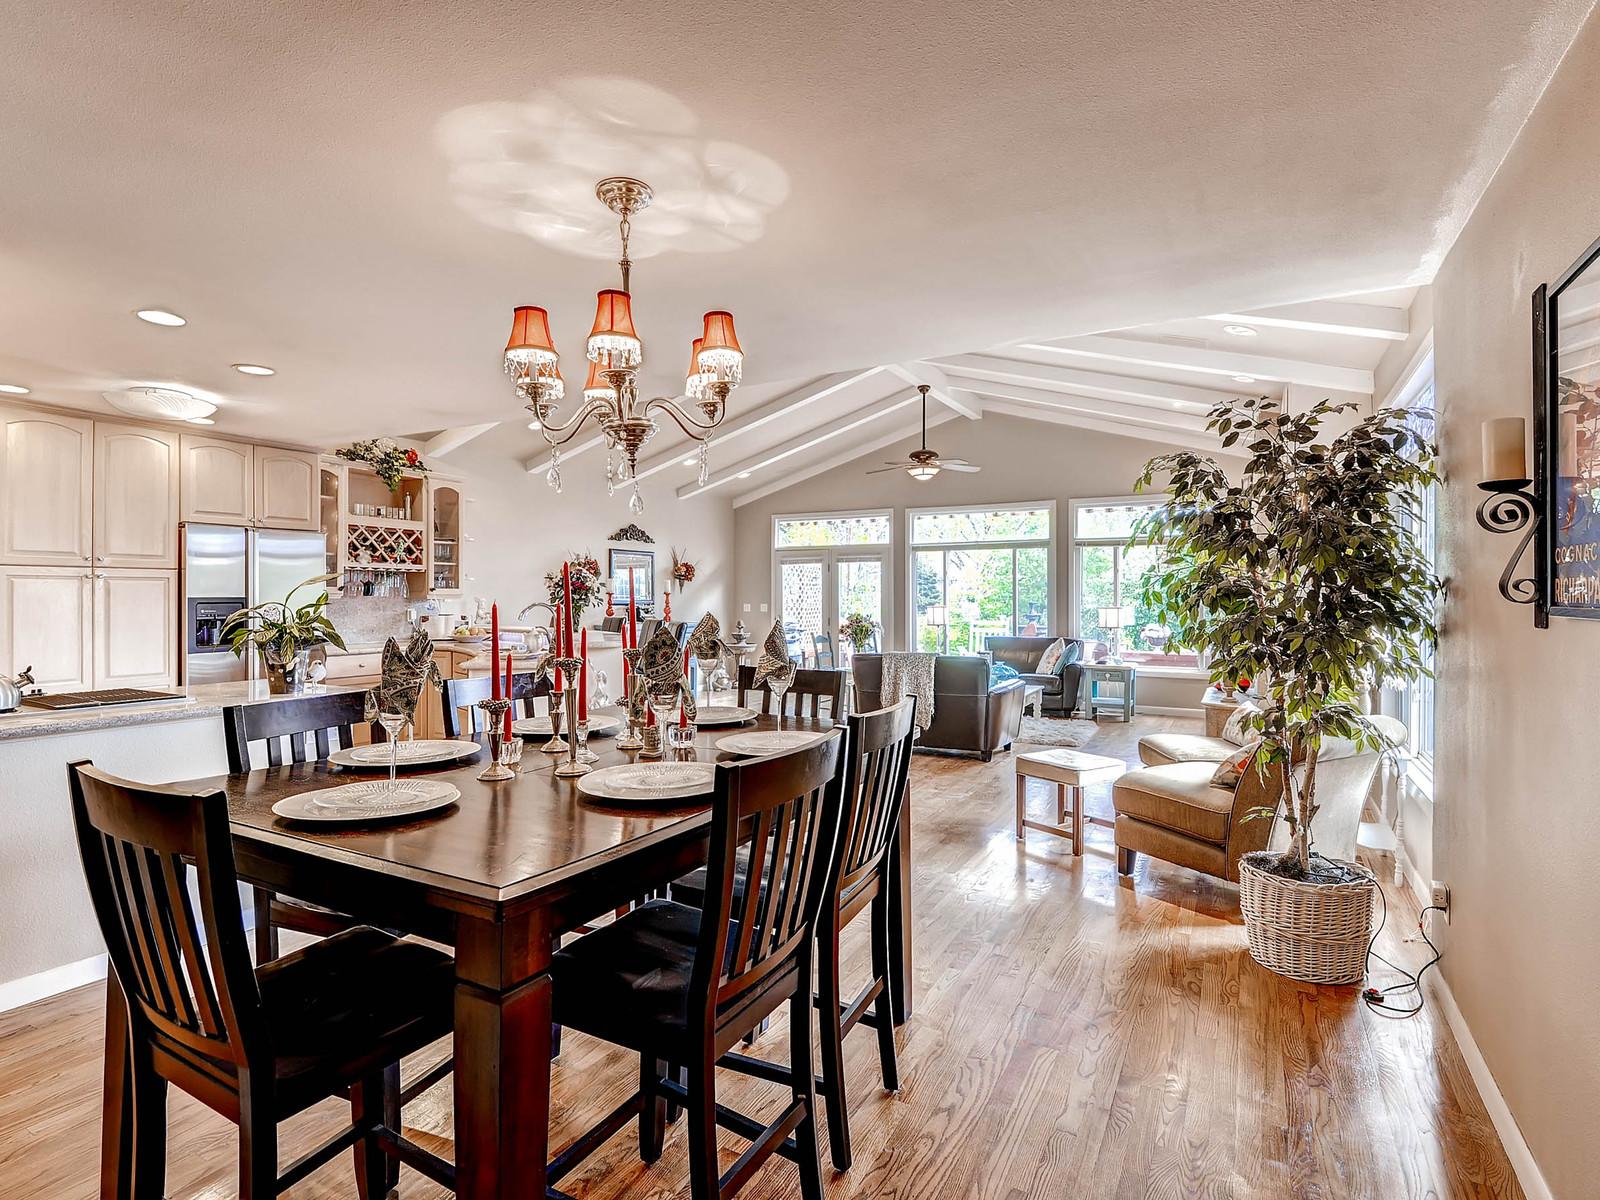 852 E Briarwood Circle S-MLS_Size-007-Dining Room-1600x1200-72dpi.jpg